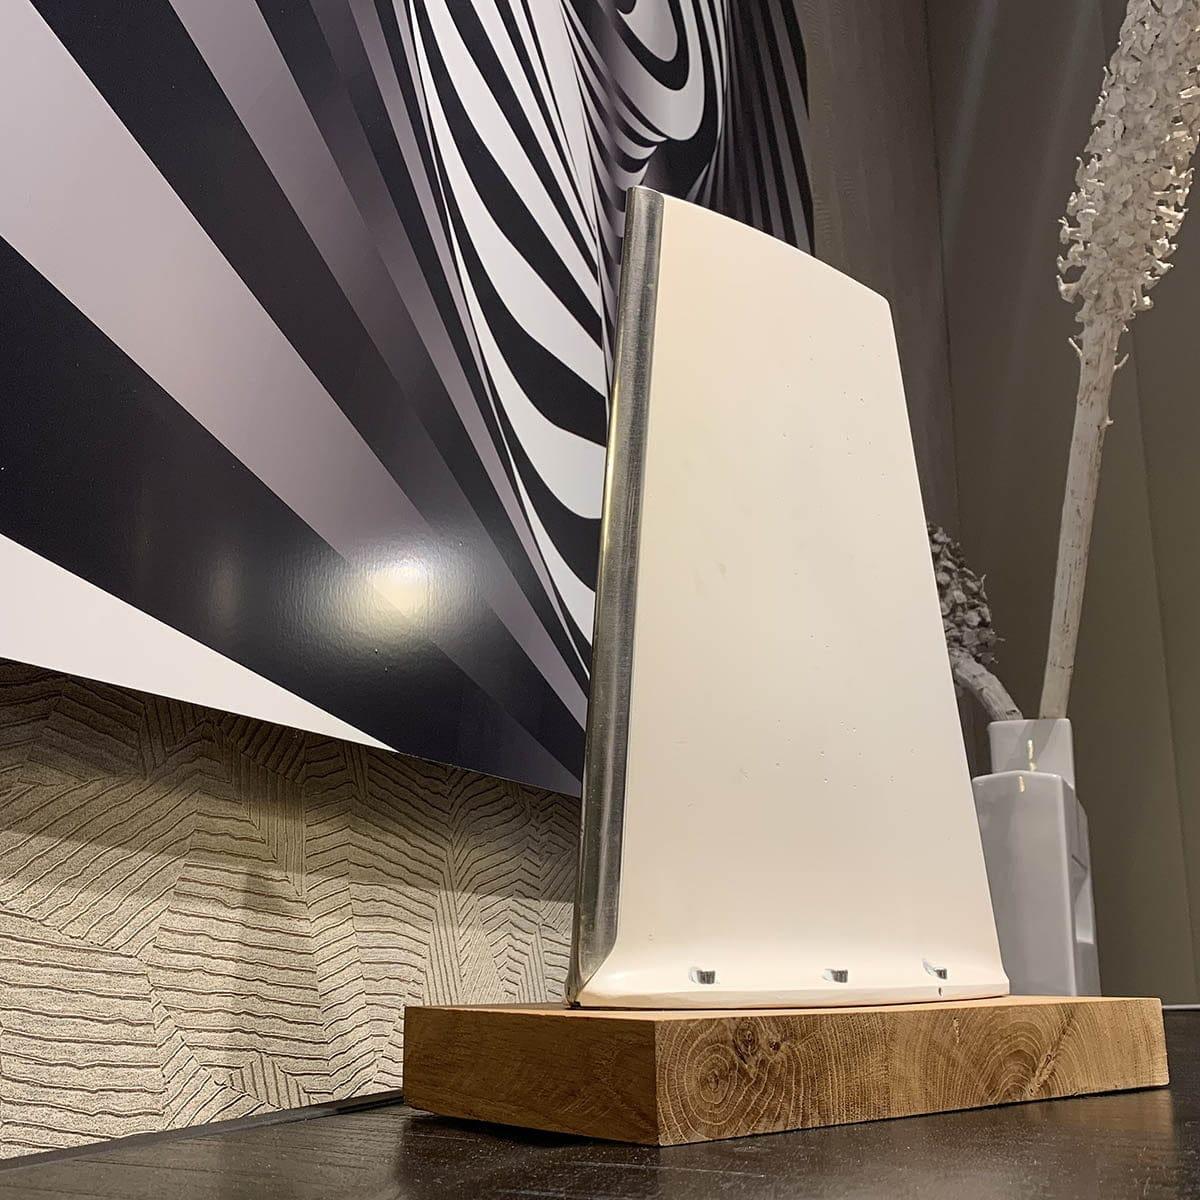 Atlantic Antenna on a cabinet.